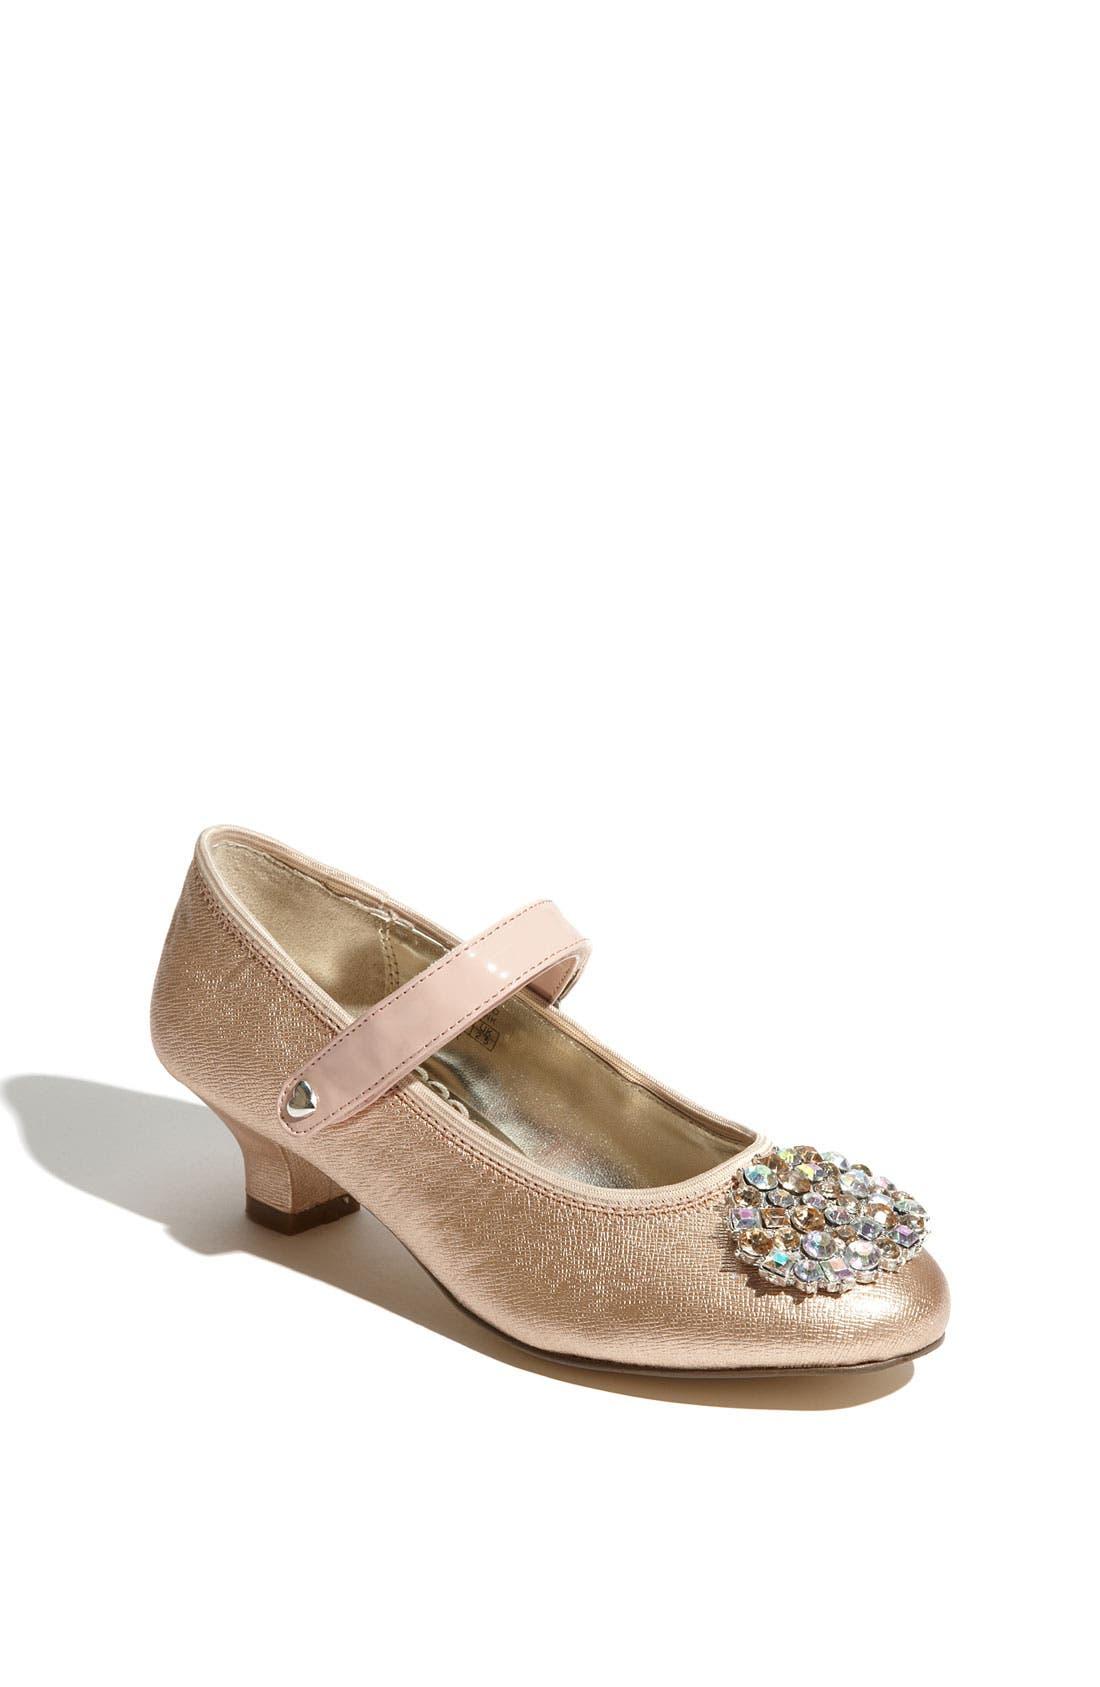 Main Image - Juicy Couture 'Phoebe' Shoe (Toddler, Little Kid & Big Kid)